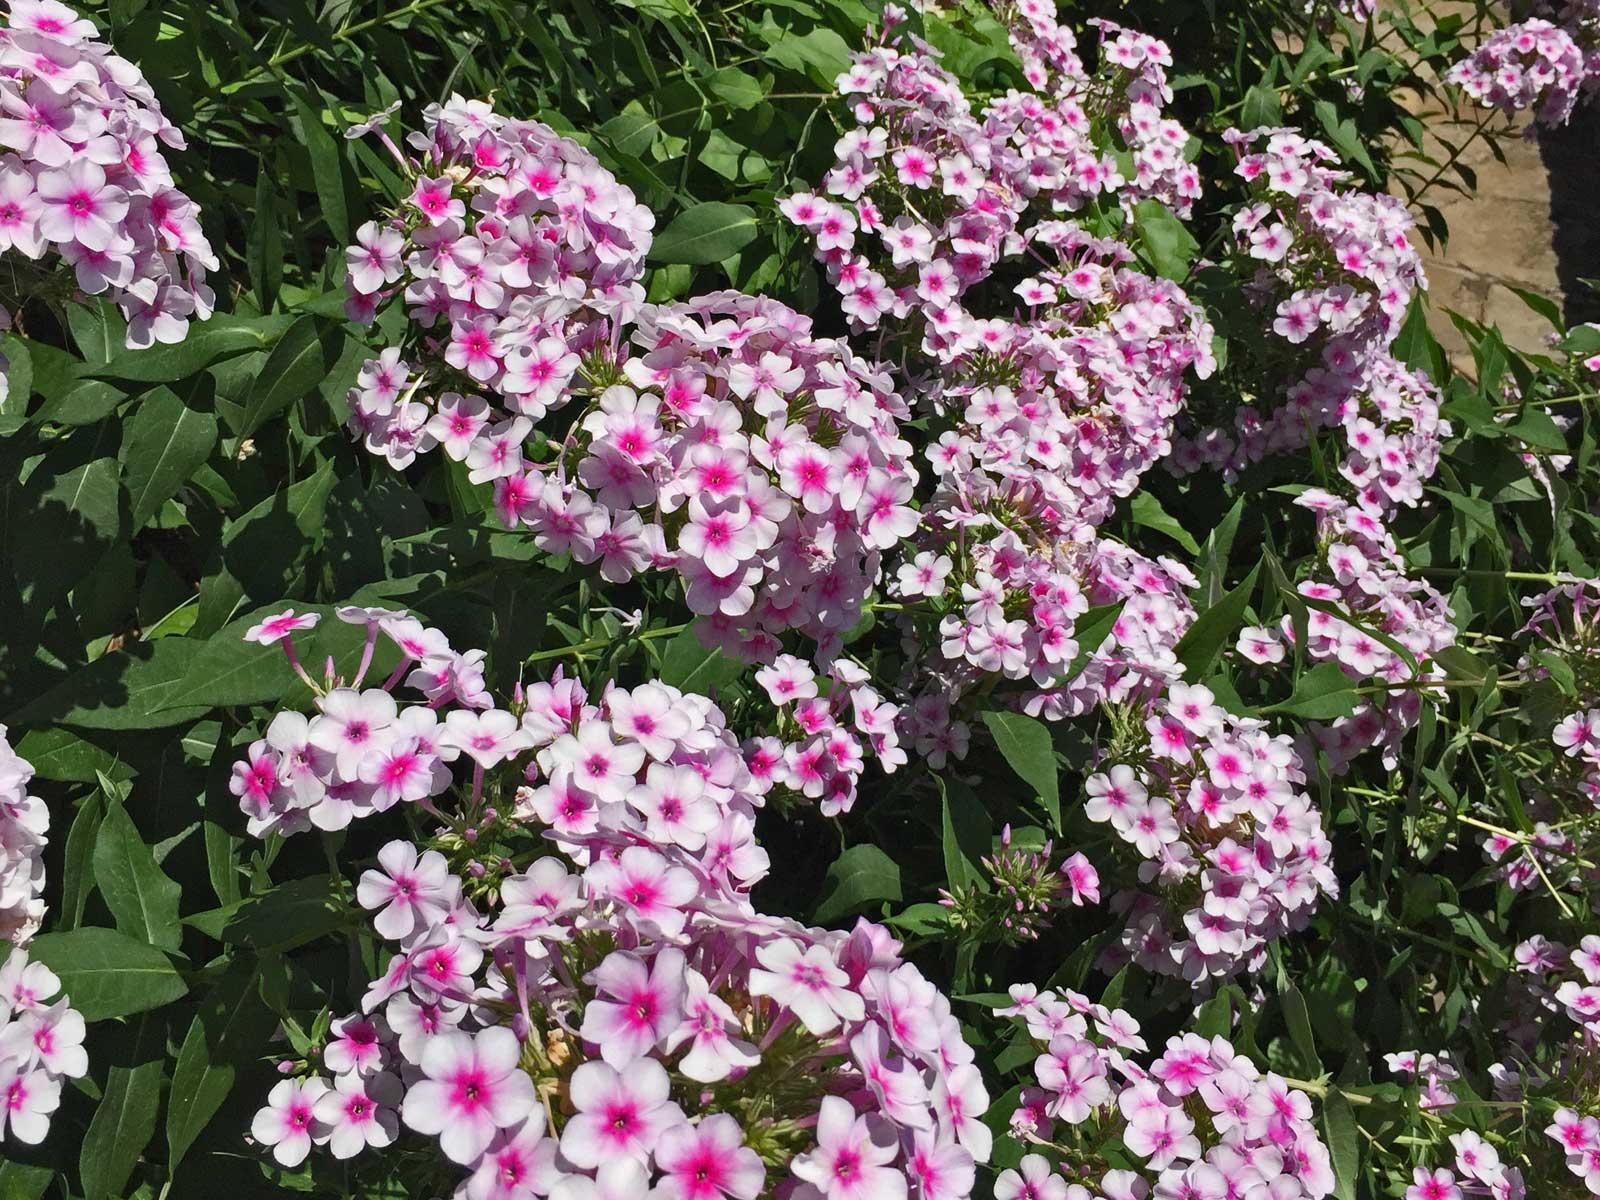 hydrangea shrub - hydrangea macrophylla spp.